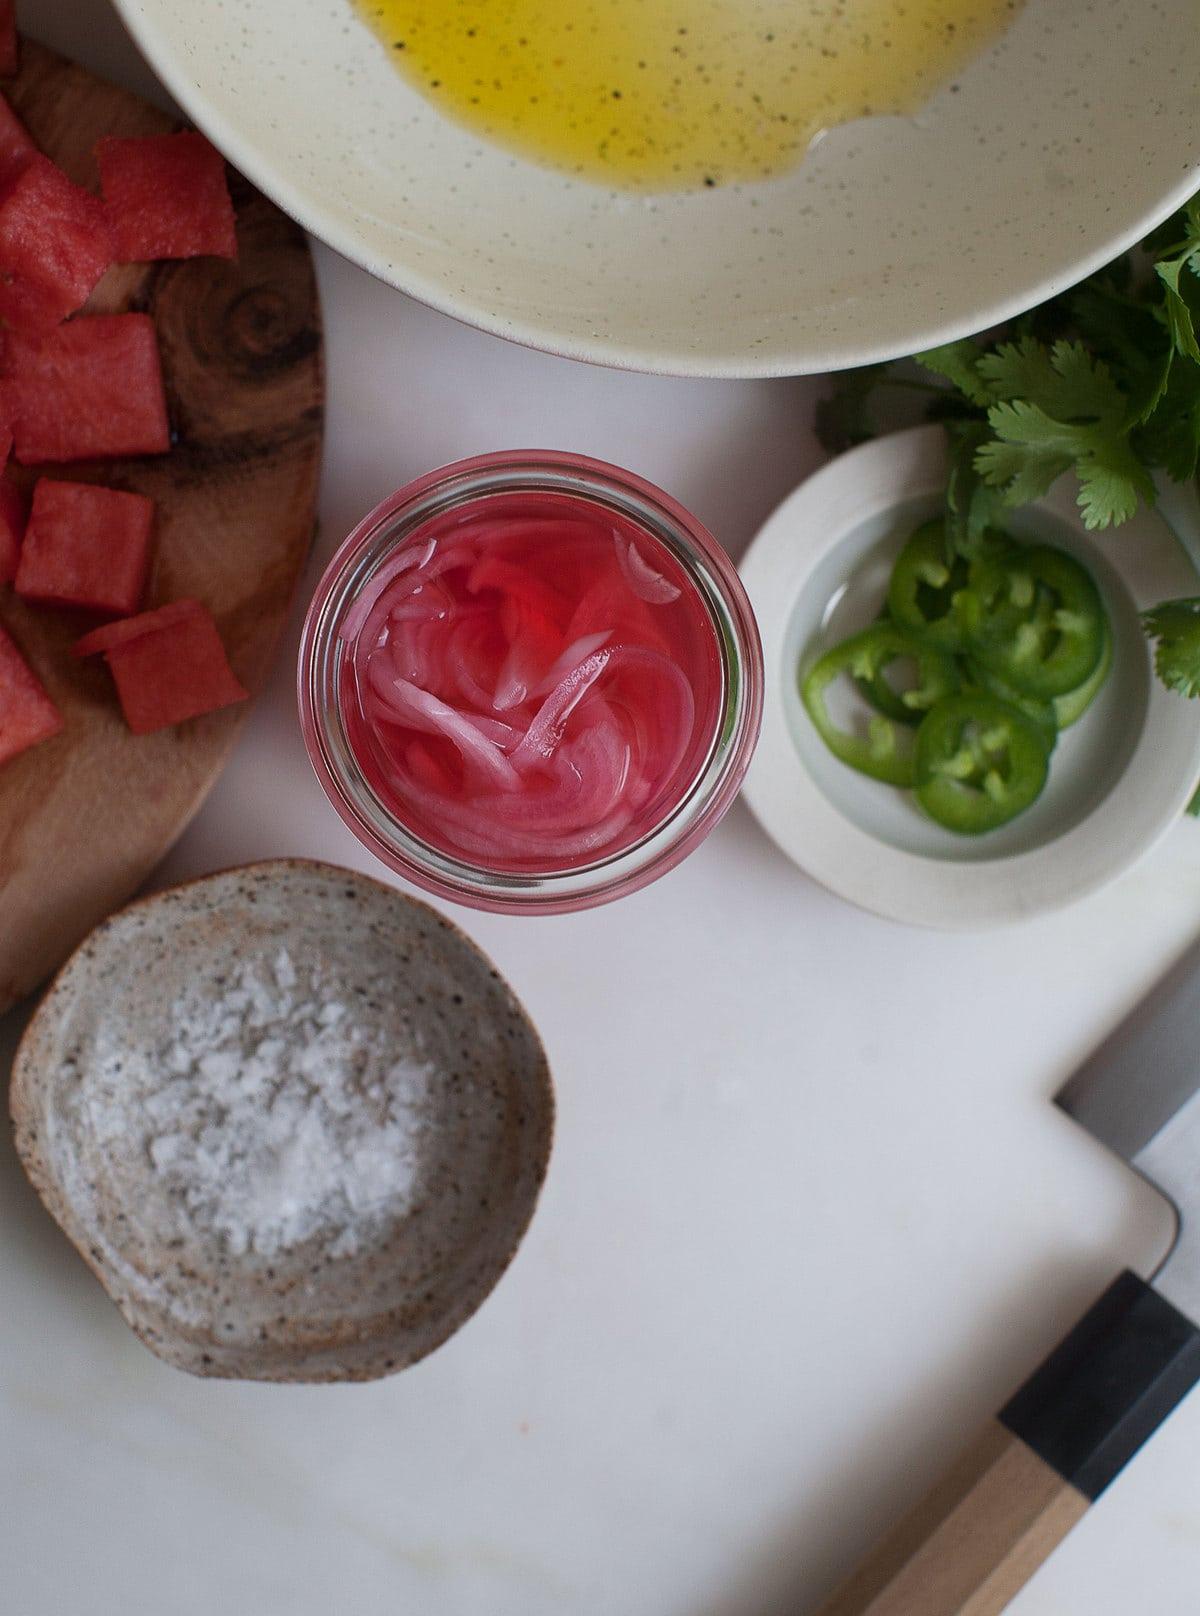 WatermelonQuesoFrescoSalad_1